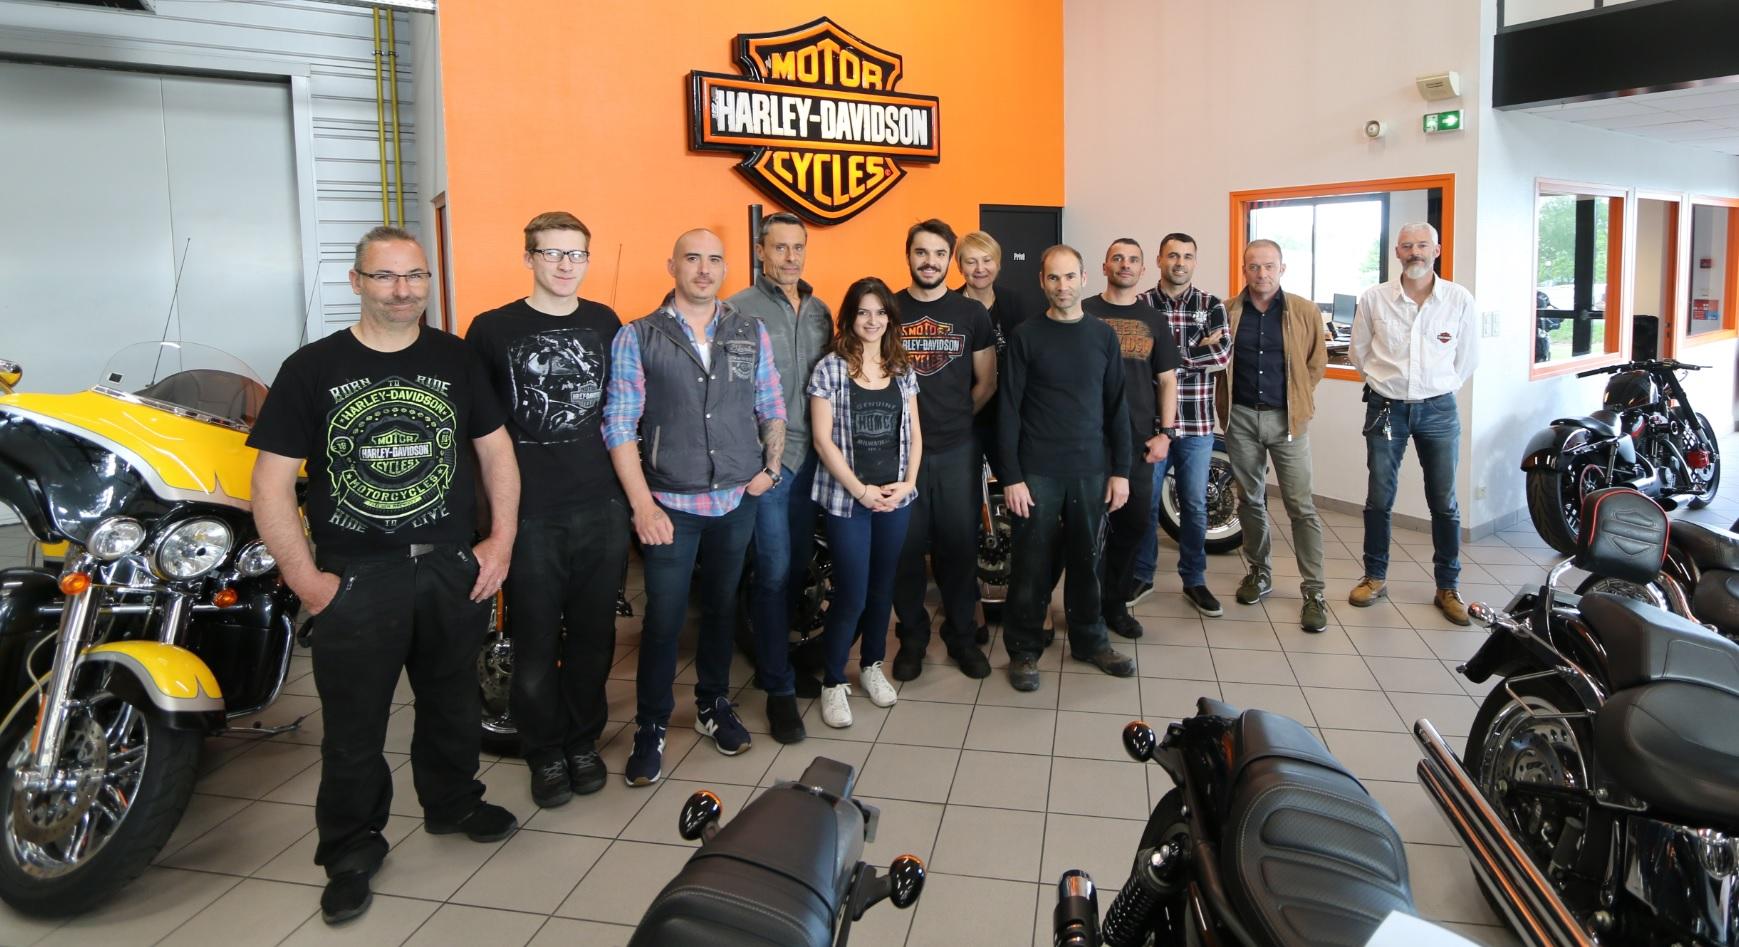 harley davidson une nouvelle histoire inventer ensemble auto moto magazine. Black Bedroom Furniture Sets. Home Design Ideas